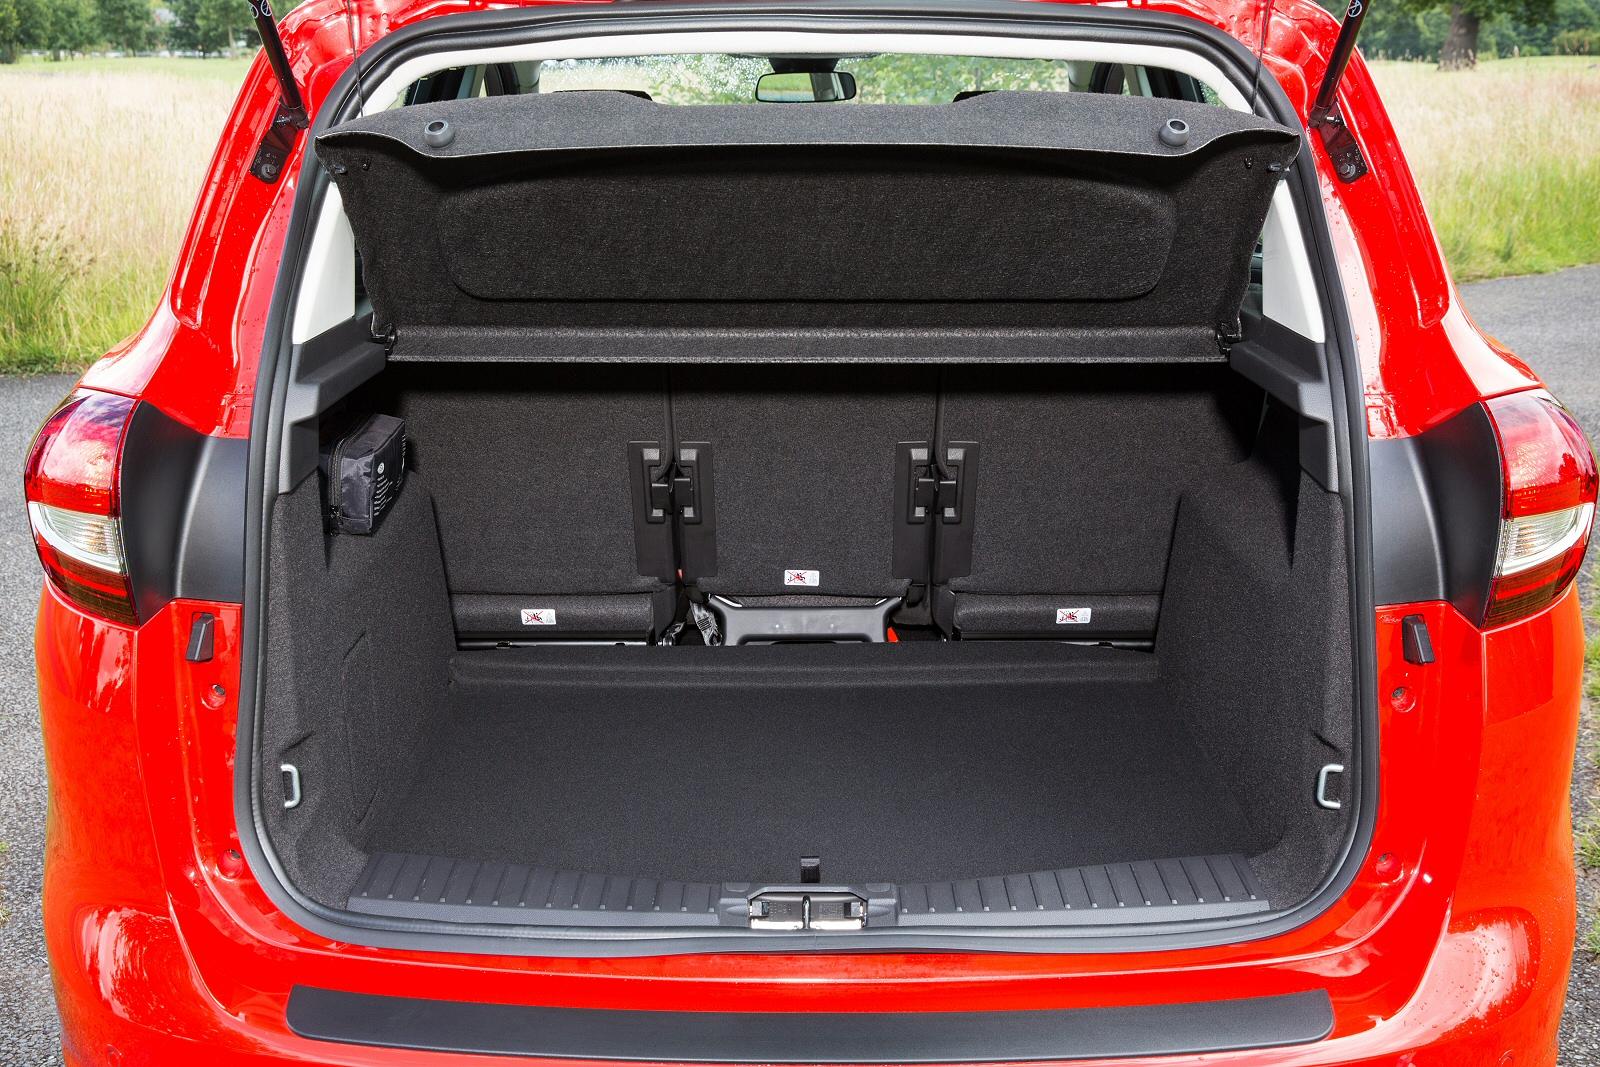 new ford c max 1 5 tdci titanium navigation 5dr powershift. Black Bedroom Furniture Sets. Home Design Ideas